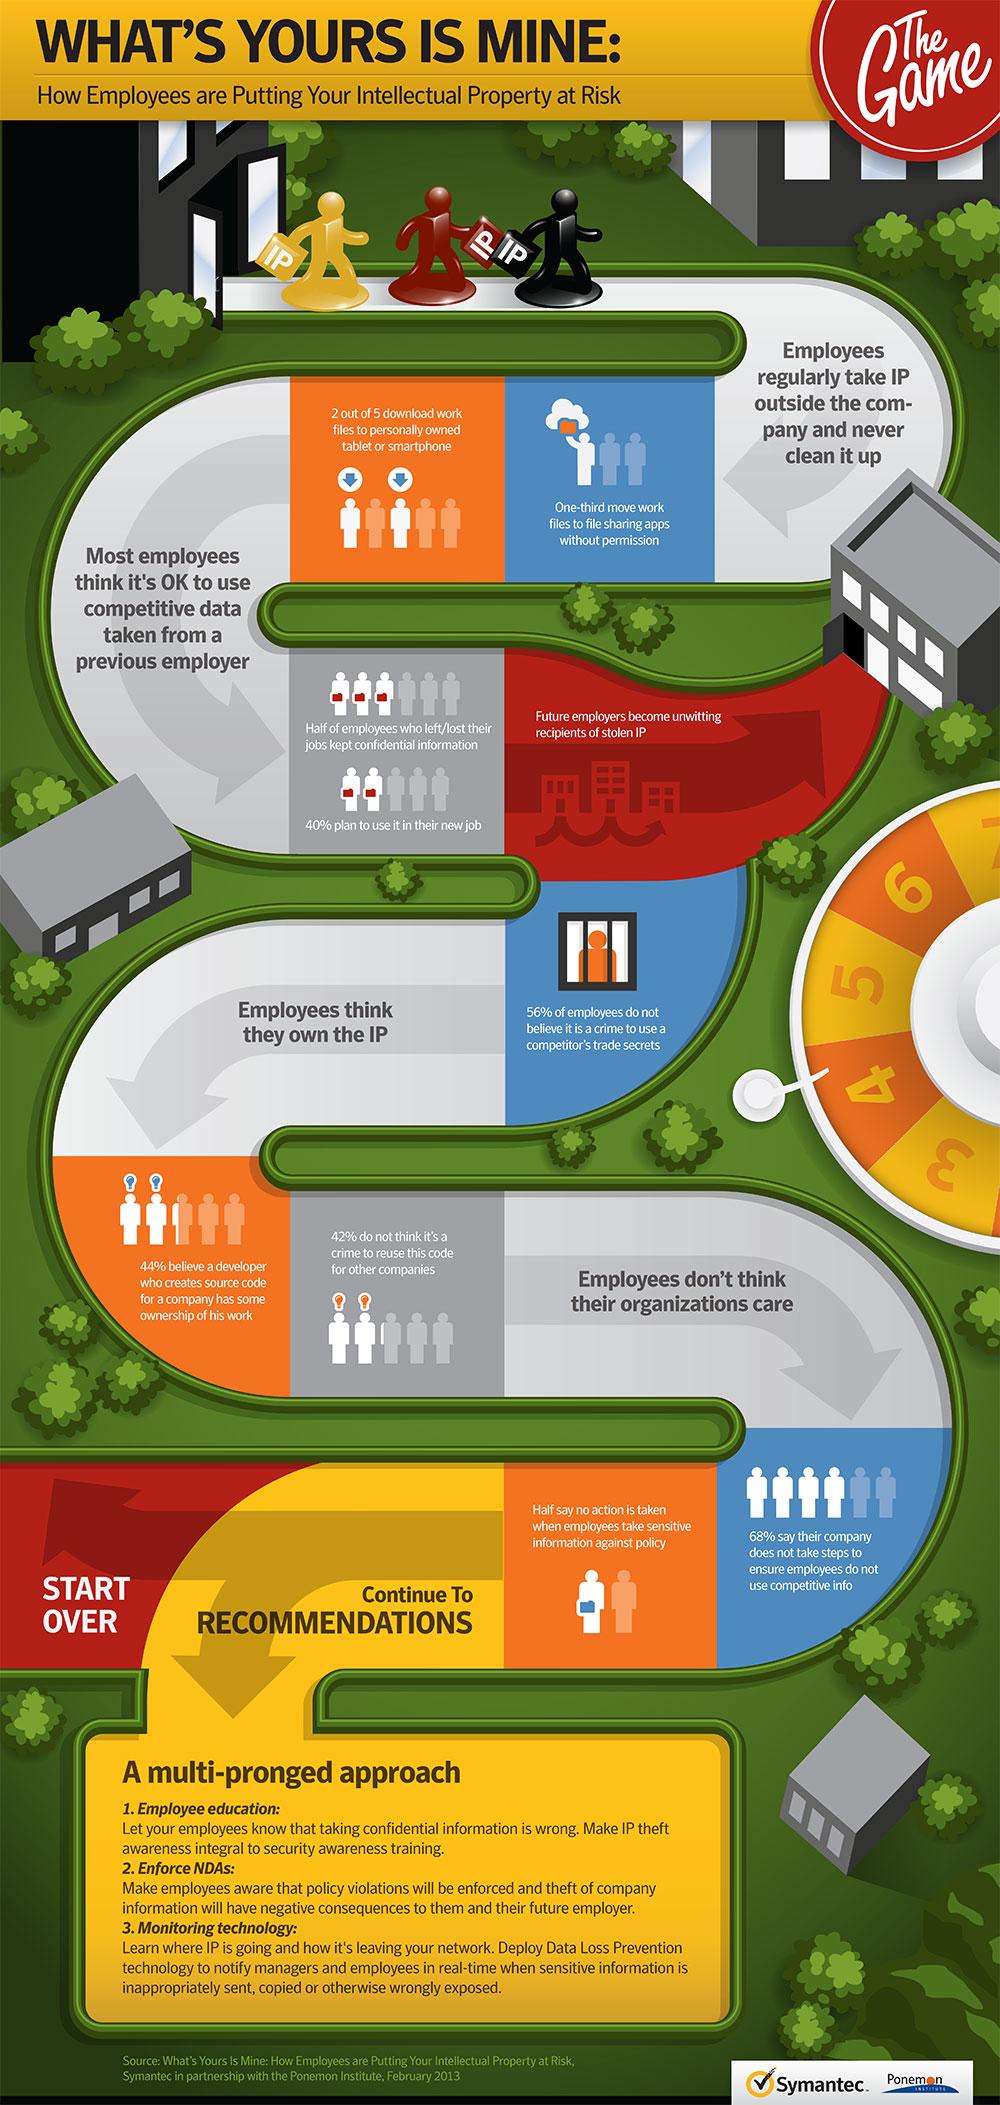 zdnet-symantec-Insider-Threat-infographic-Rev-J-2013-02-06